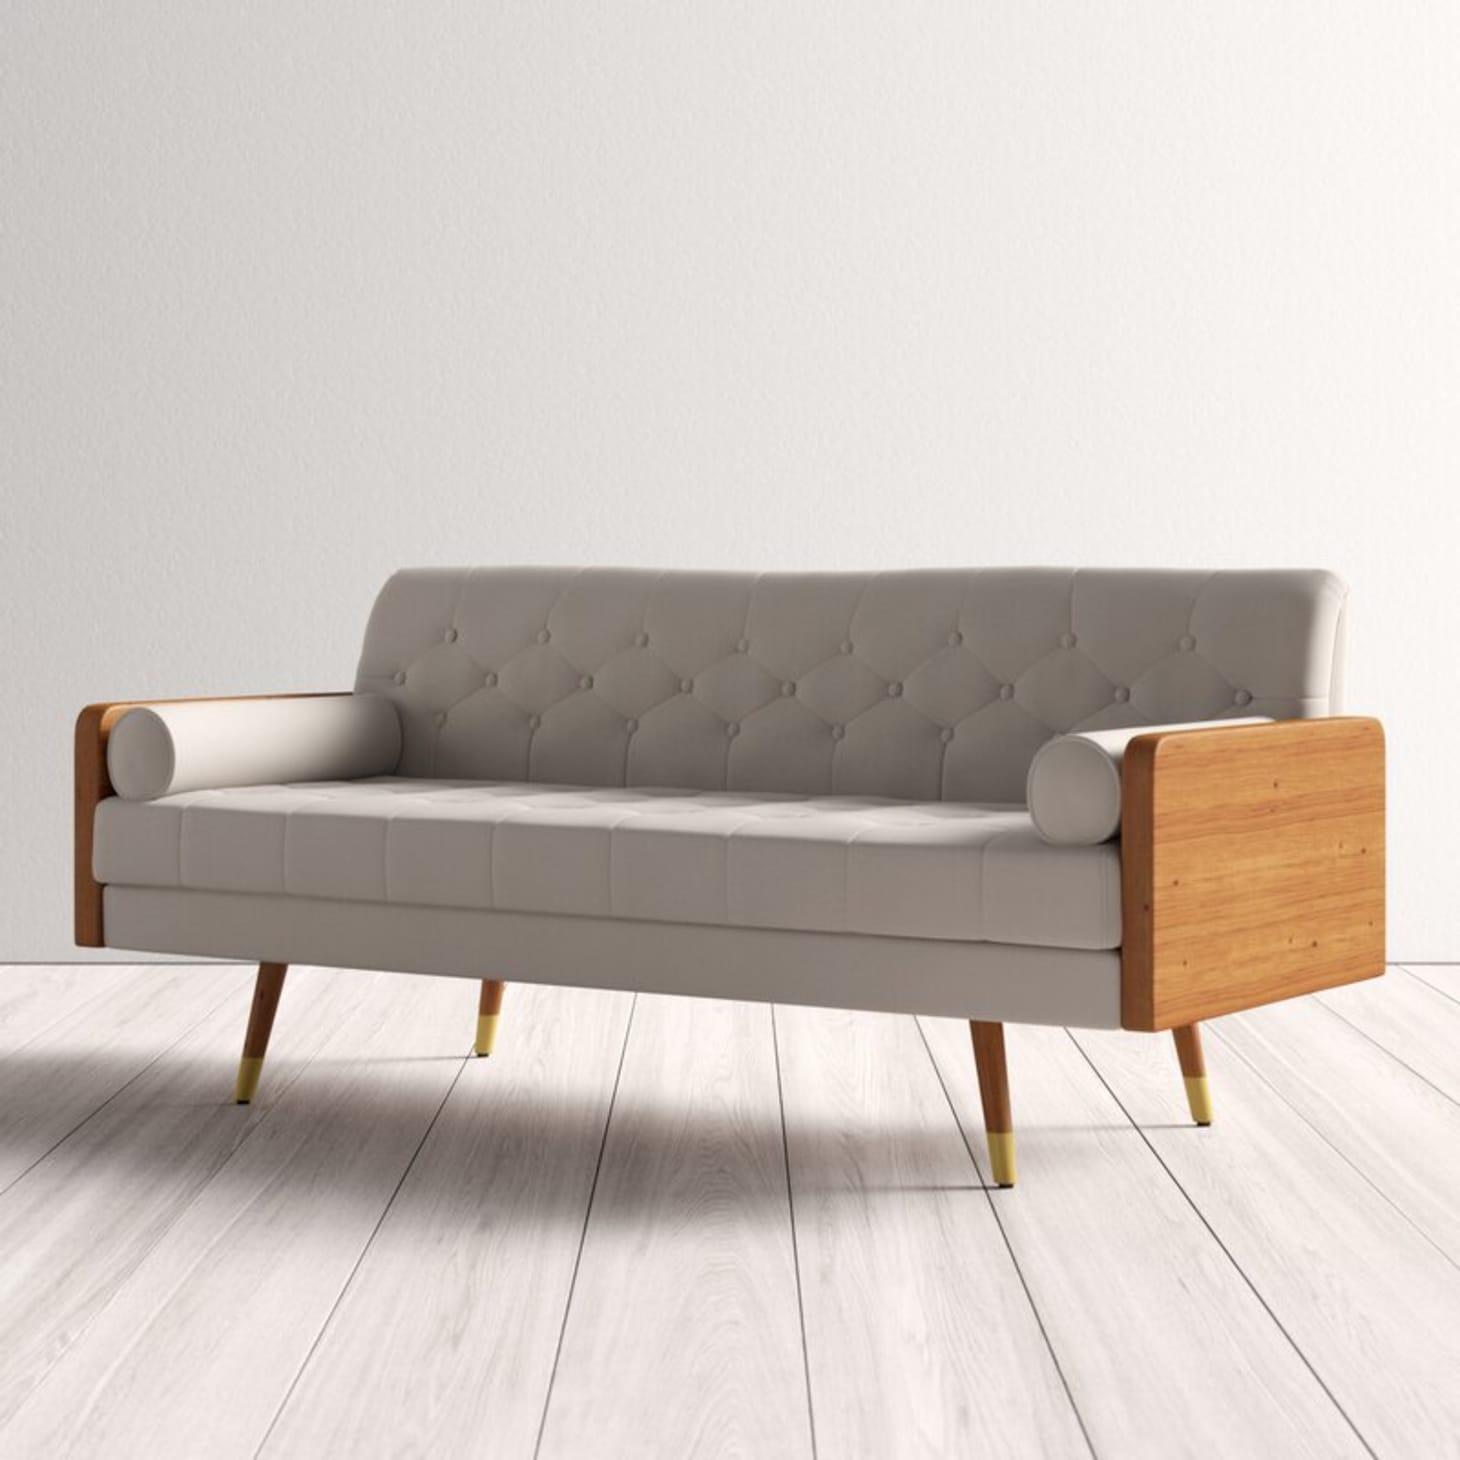 Terrific The Best Couches For Your Small Space Apartment Therapy Inzonedesignstudio Interior Chair Design Inzonedesignstudiocom